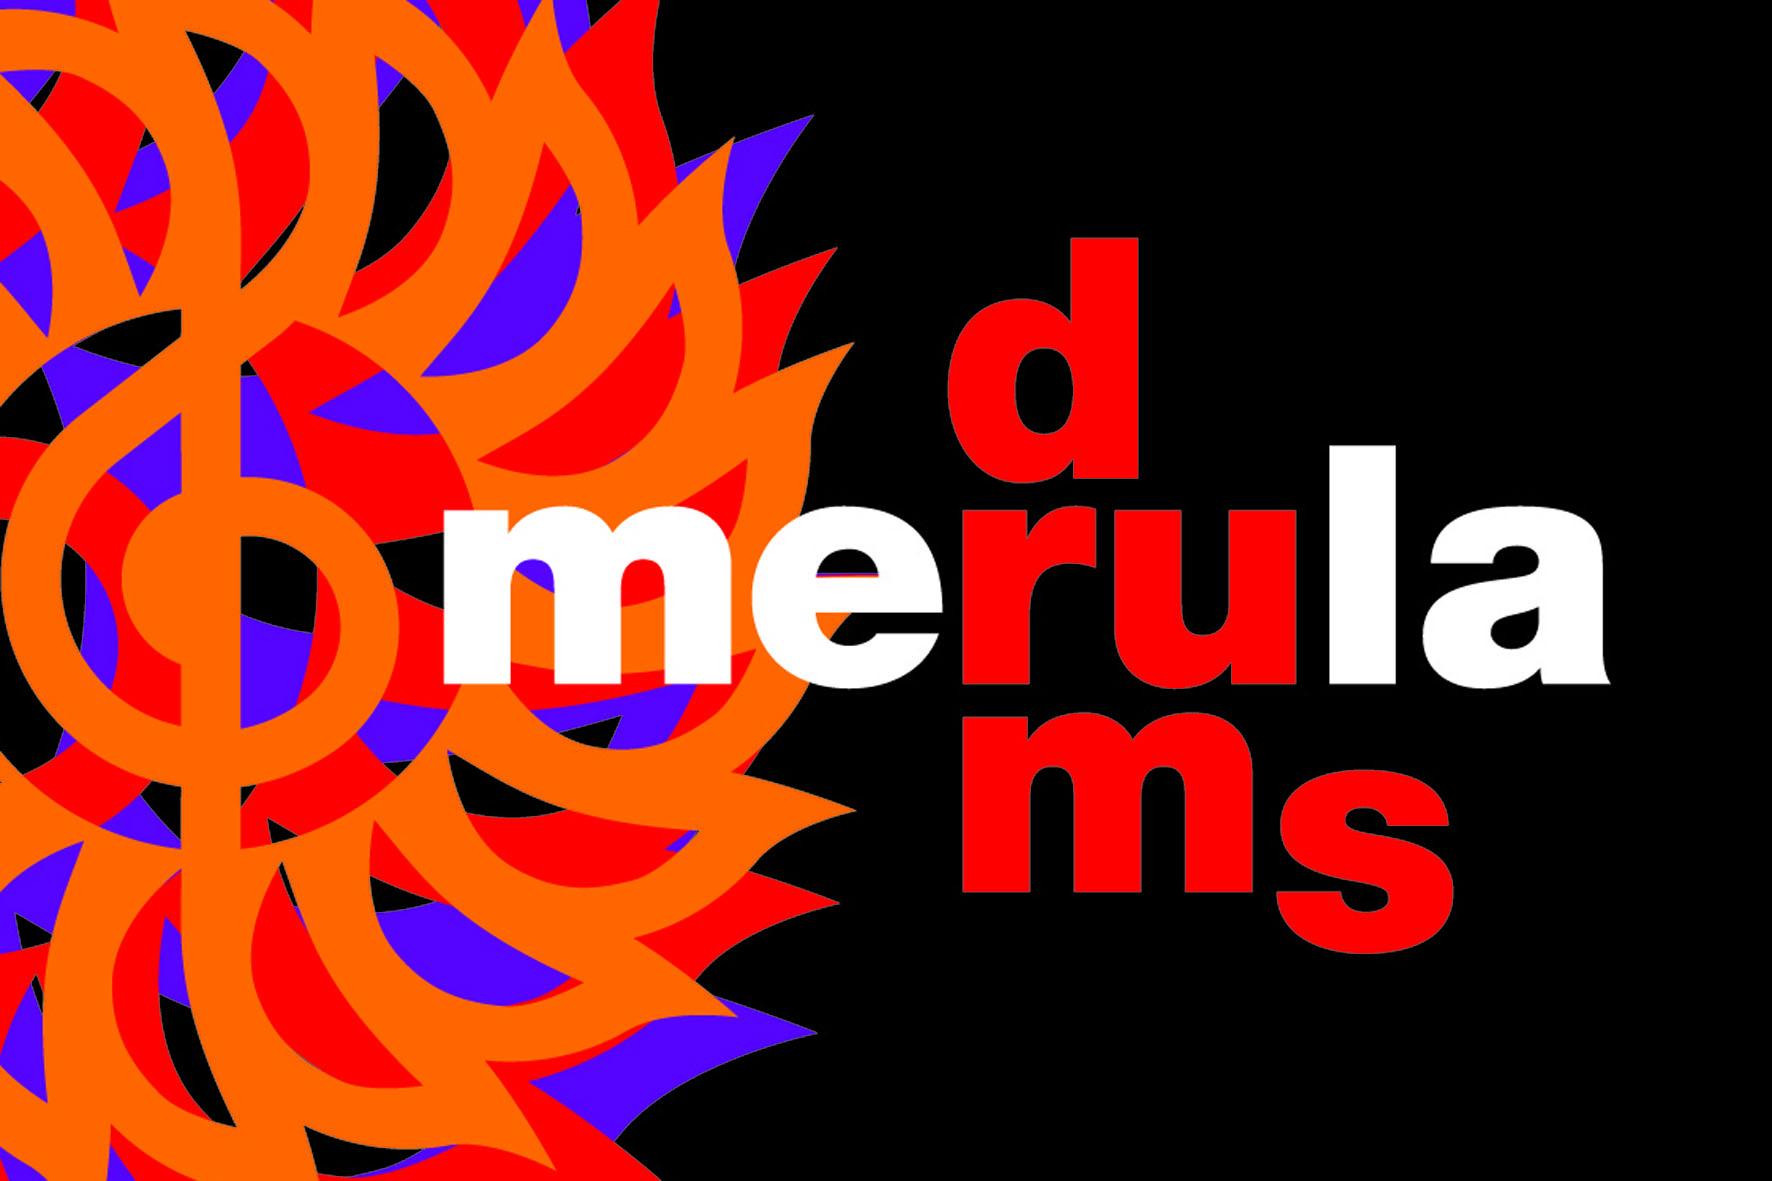 Merula-drums-logogenesi